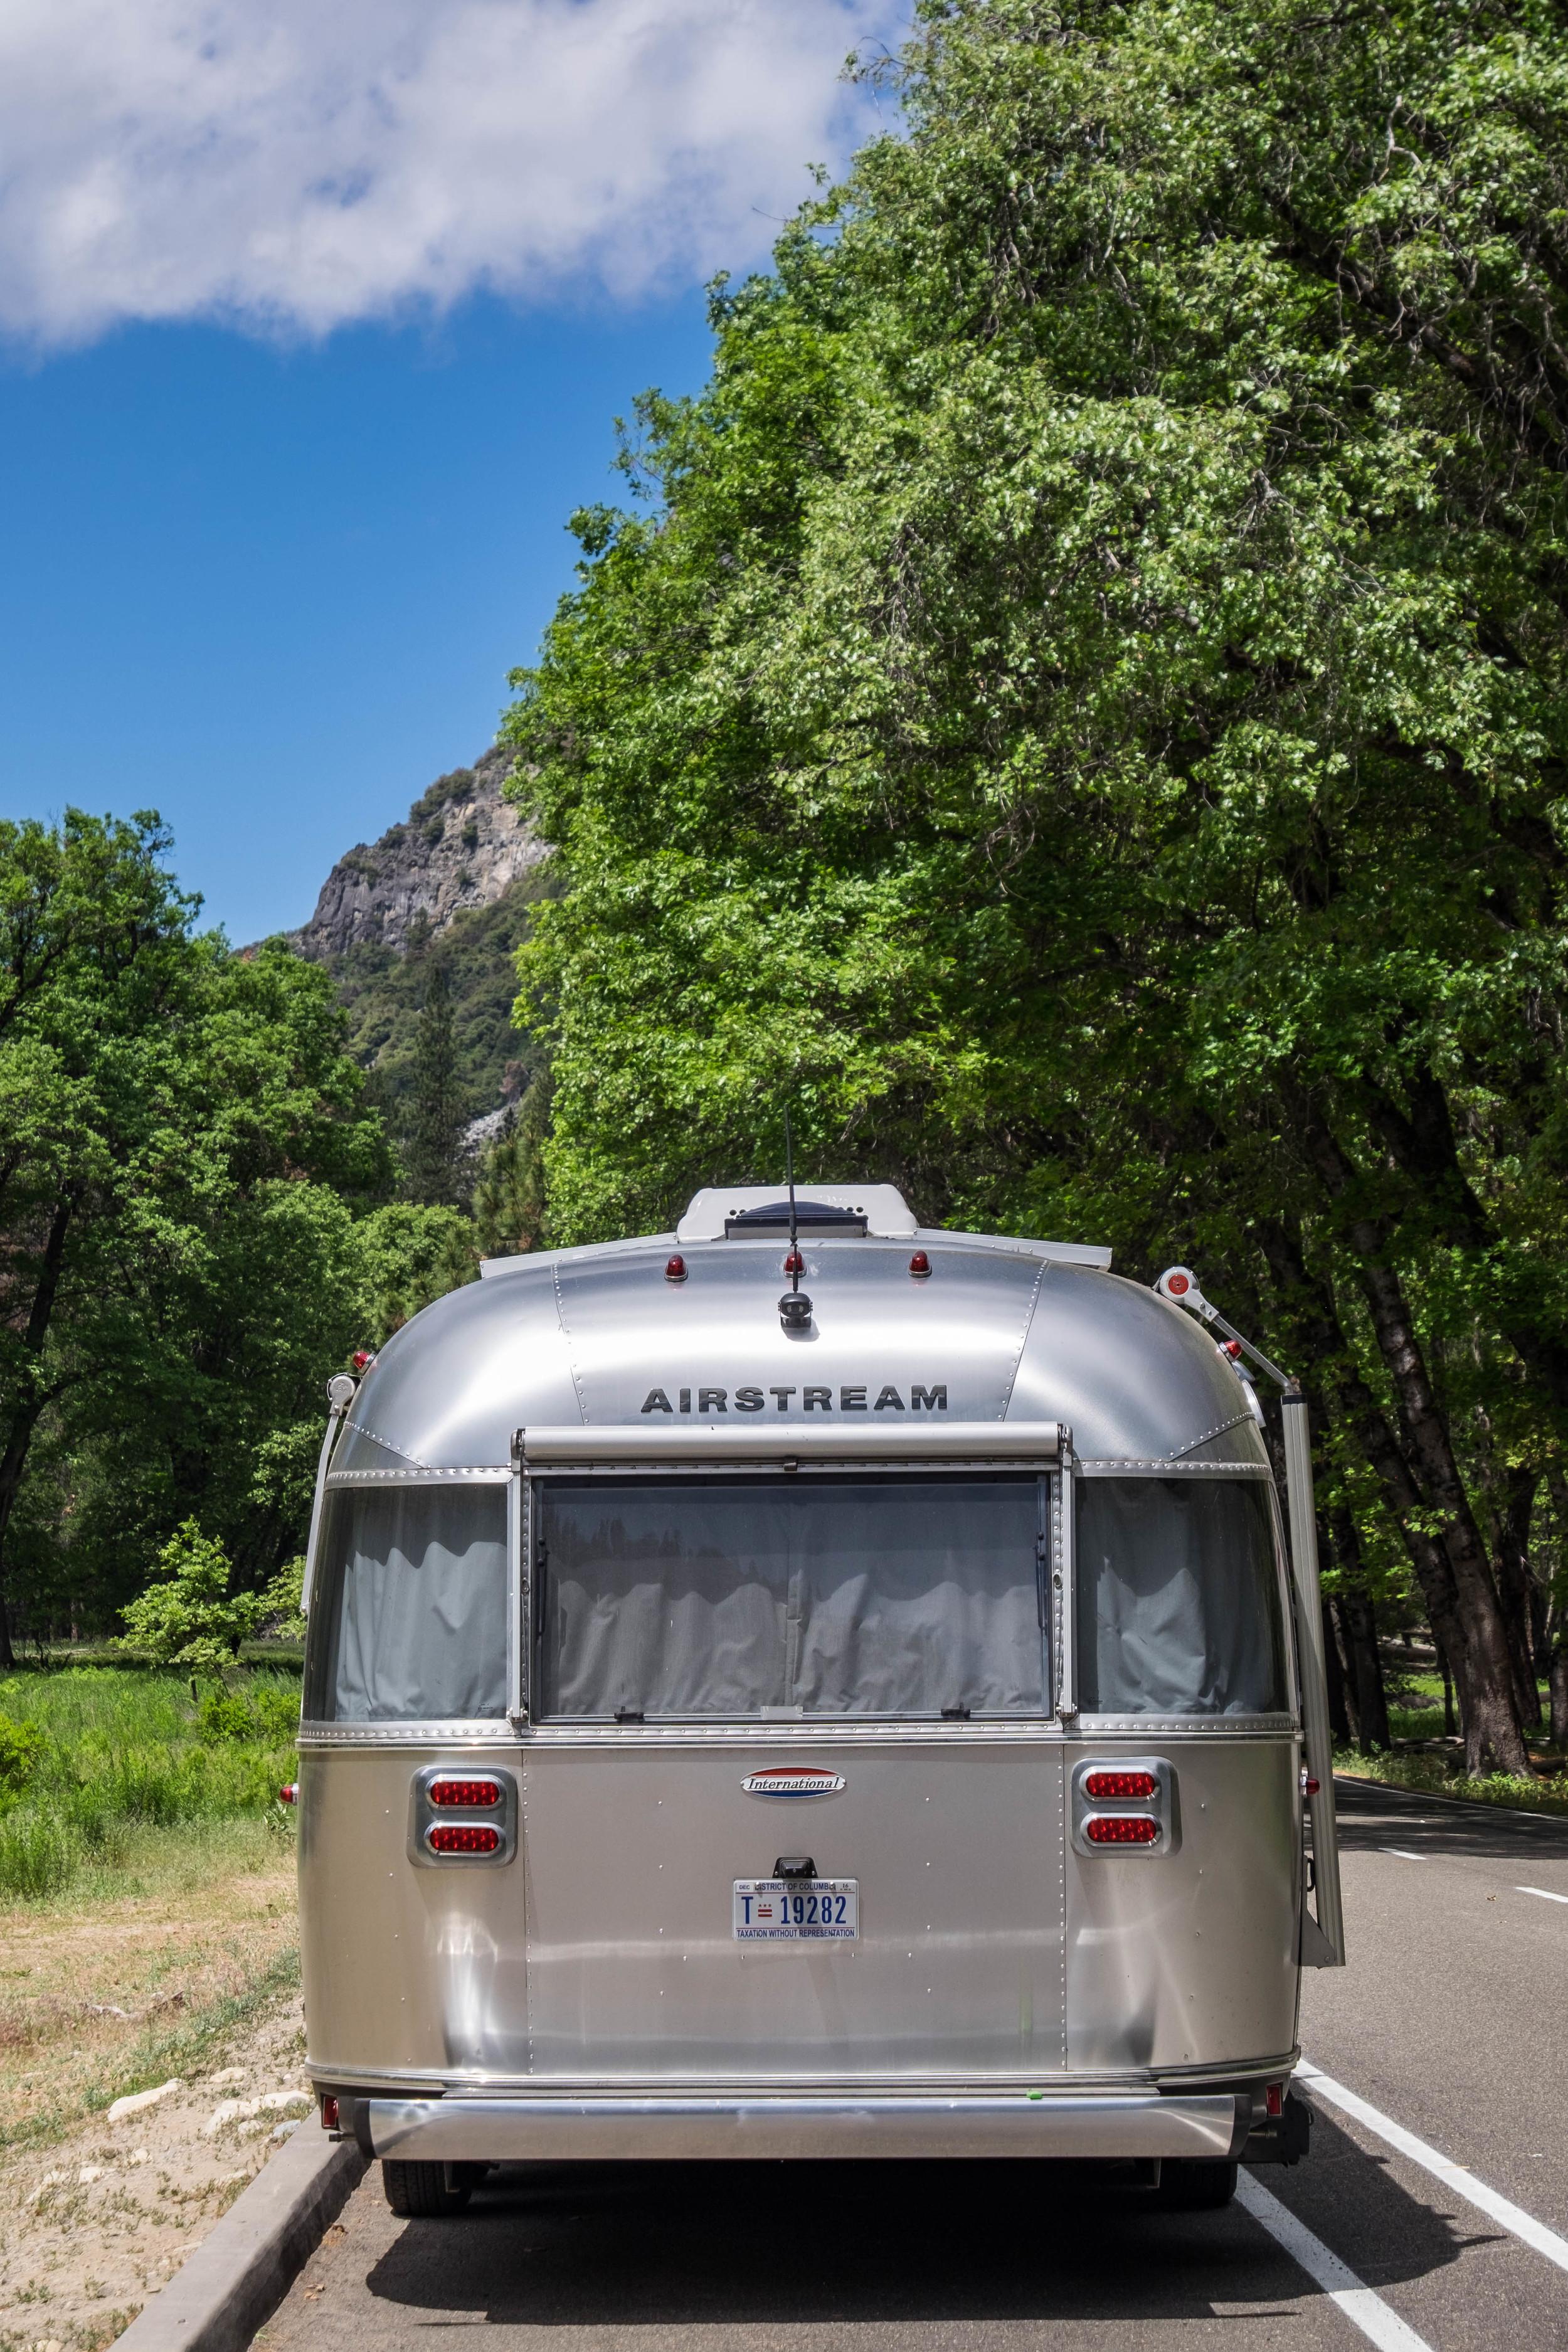 20160520-SP-Yosemite National Park-_DSF4848.jpg